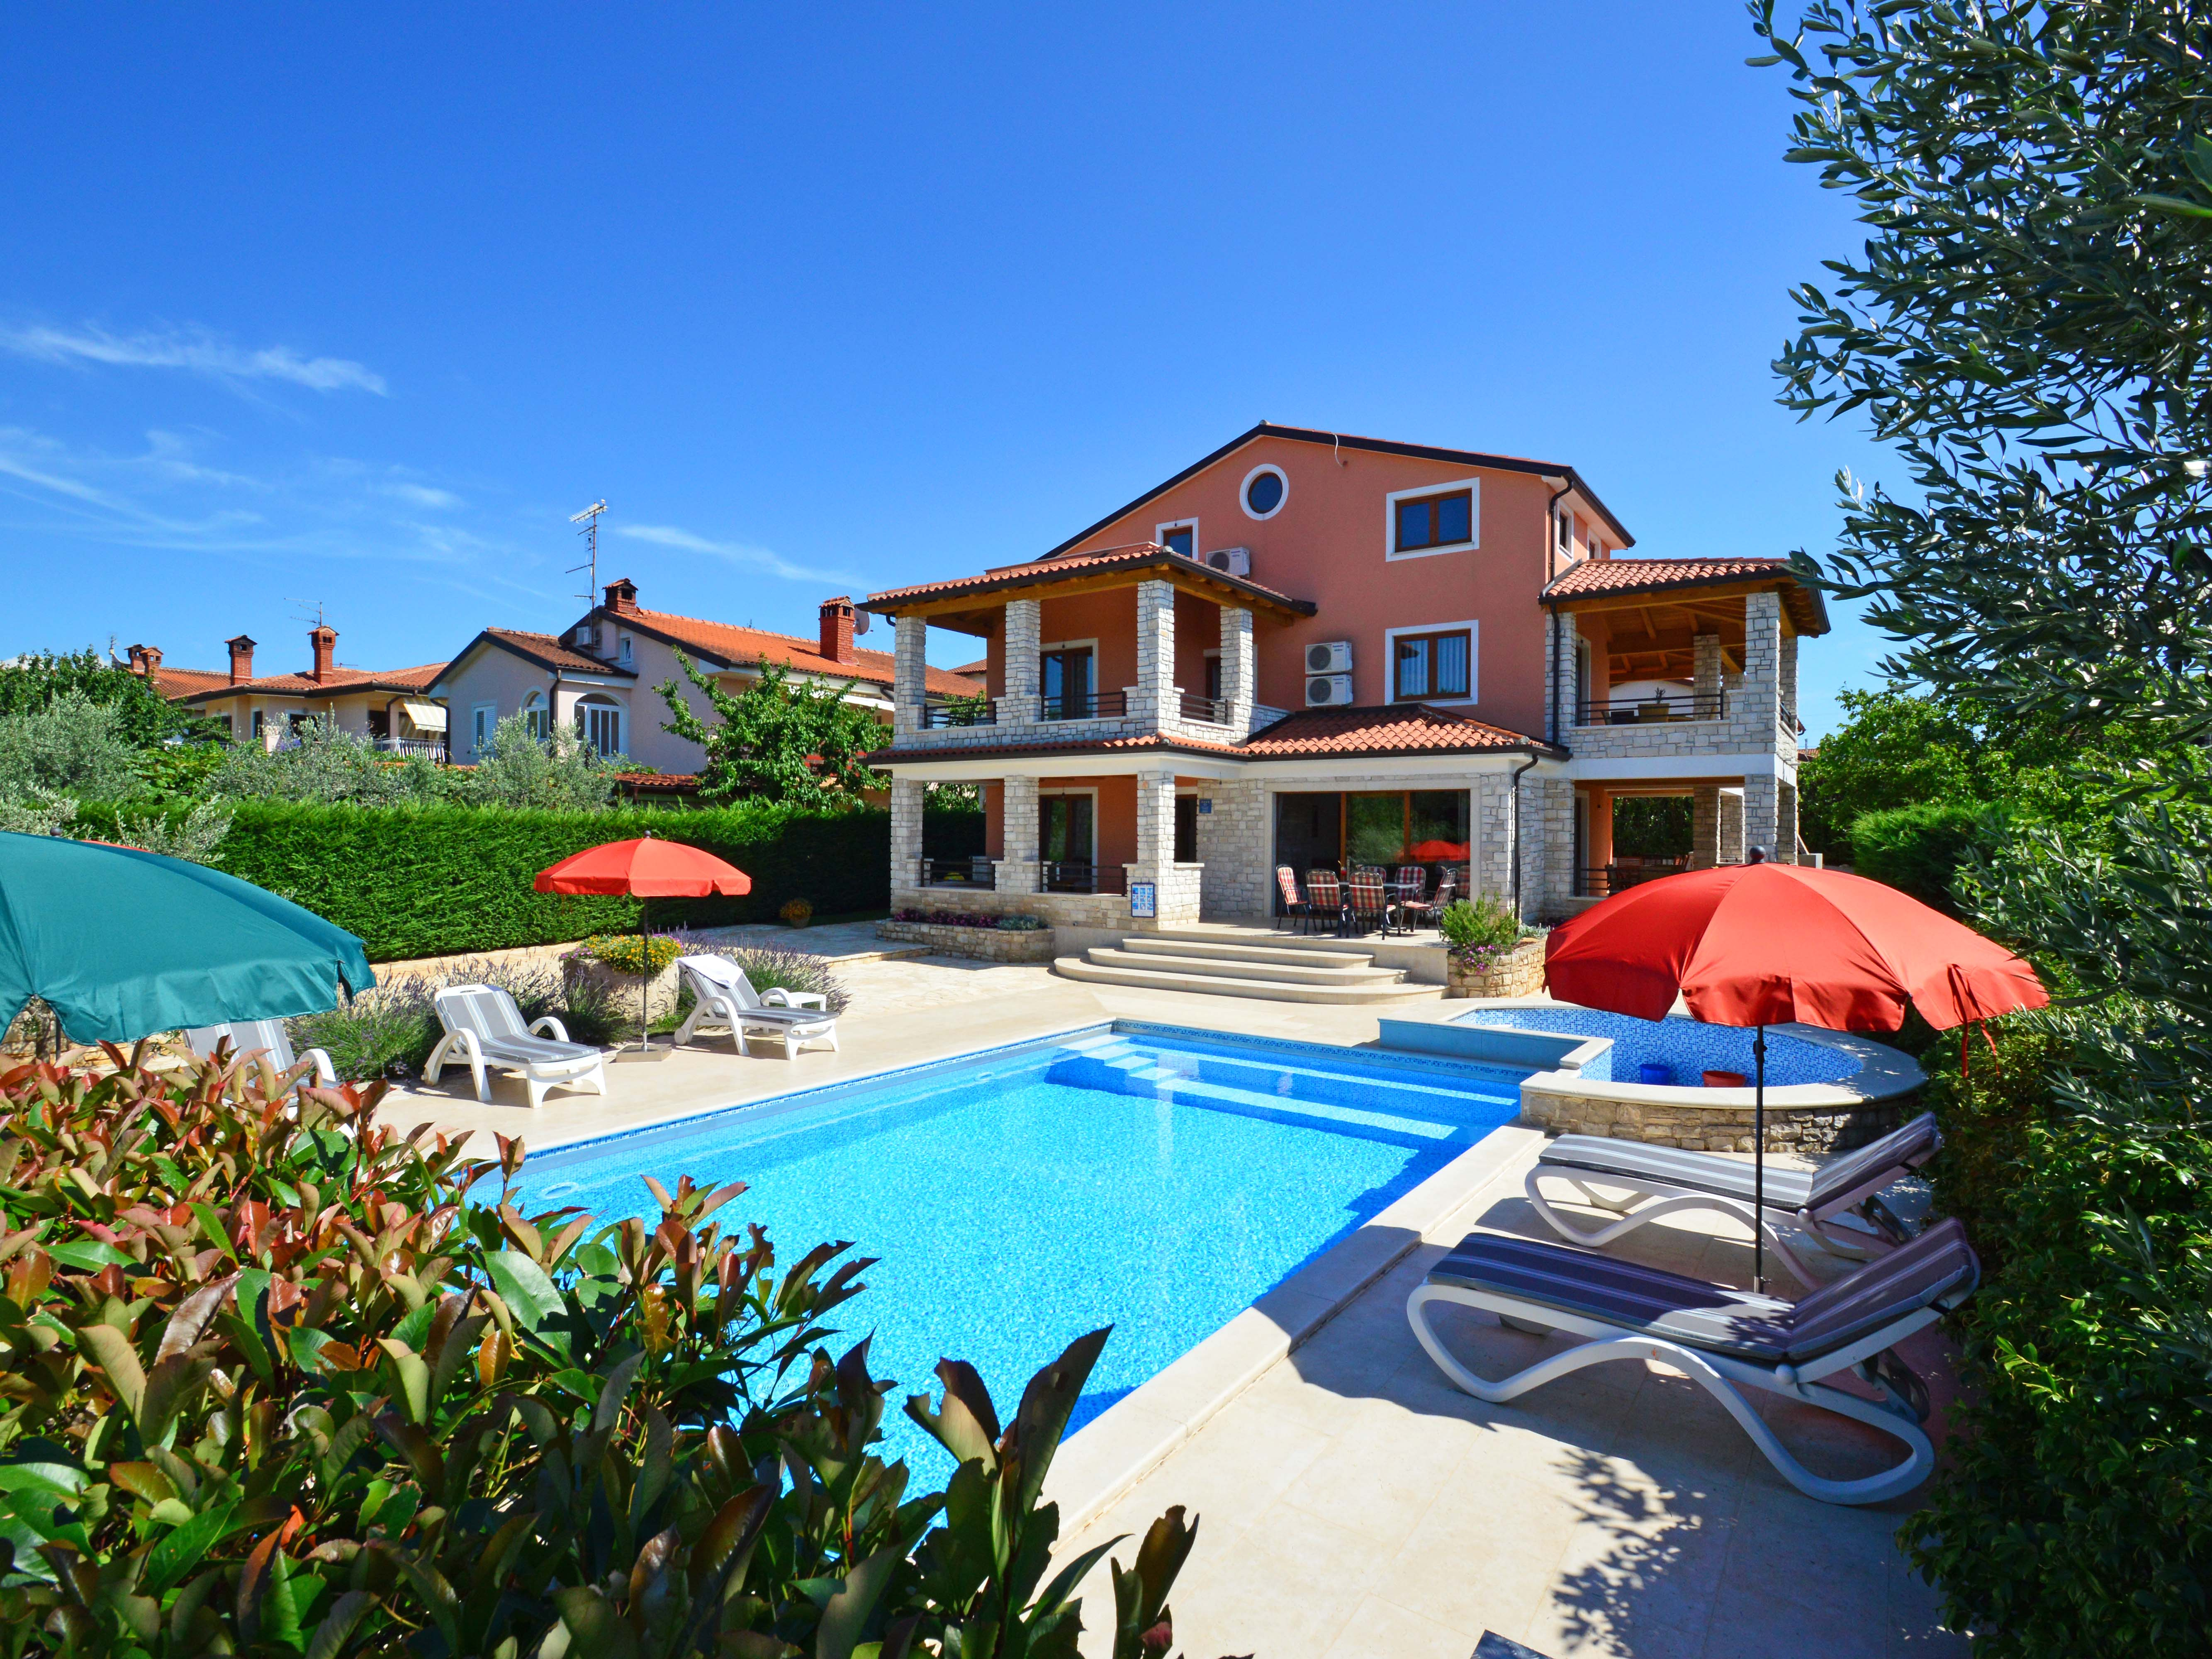 ferienhaus villa anamaria in buje plovanija kroatien interhome. Black Bedroom Furniture Sets. Home Design Ideas